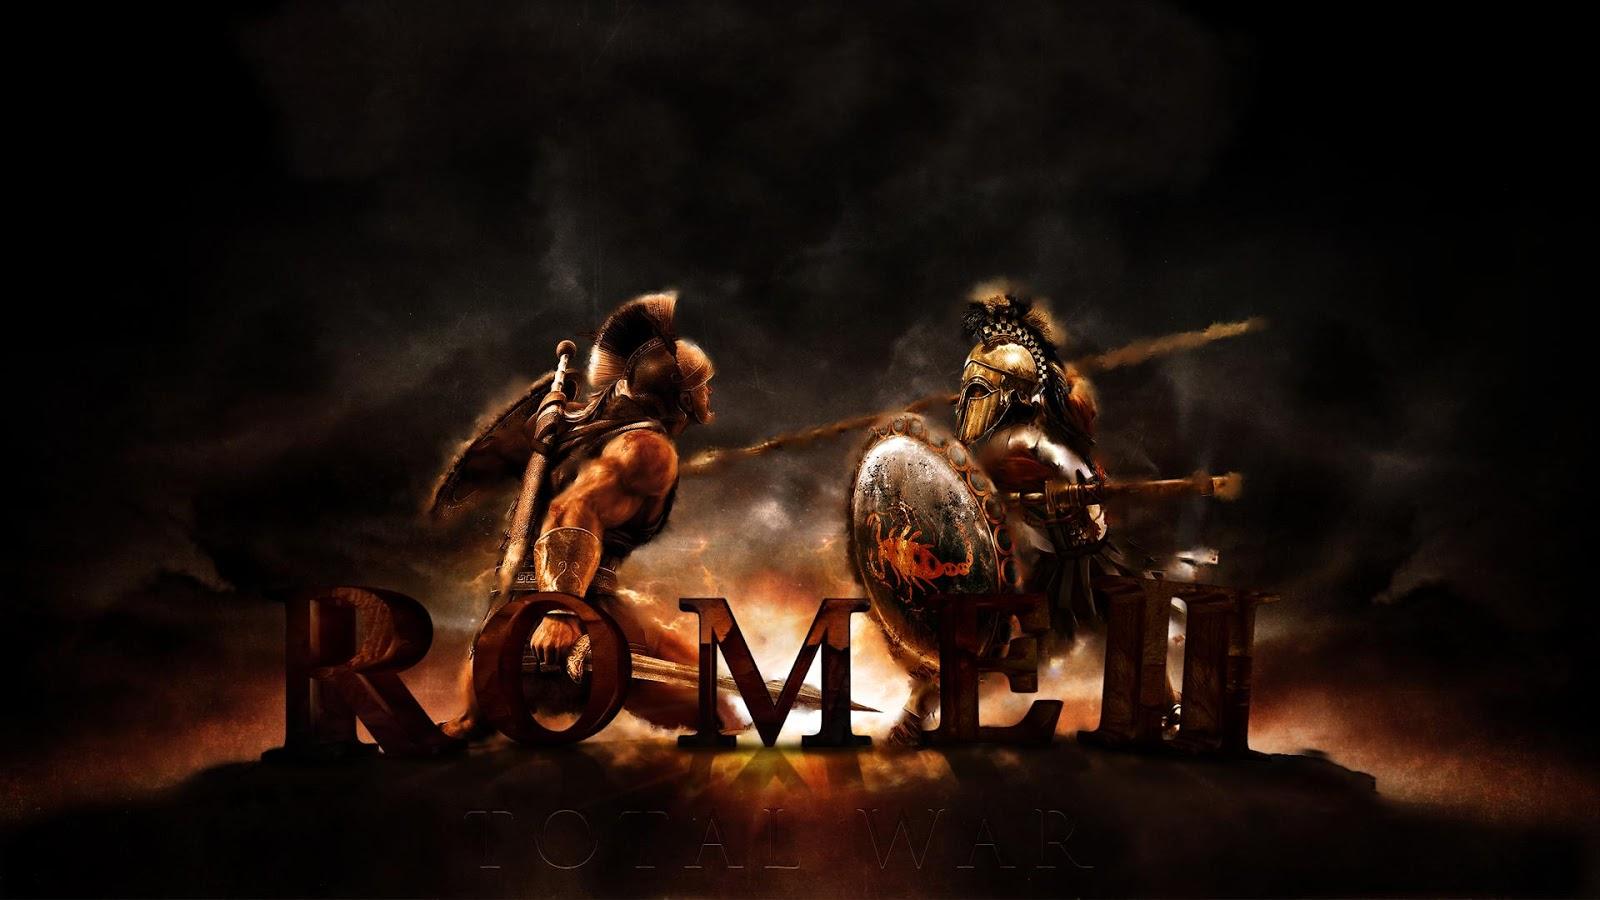 Rome Total War Wallpaper: Ihot Wallons: HD Wallpapers Fine: Roman Colosseum- Wonder